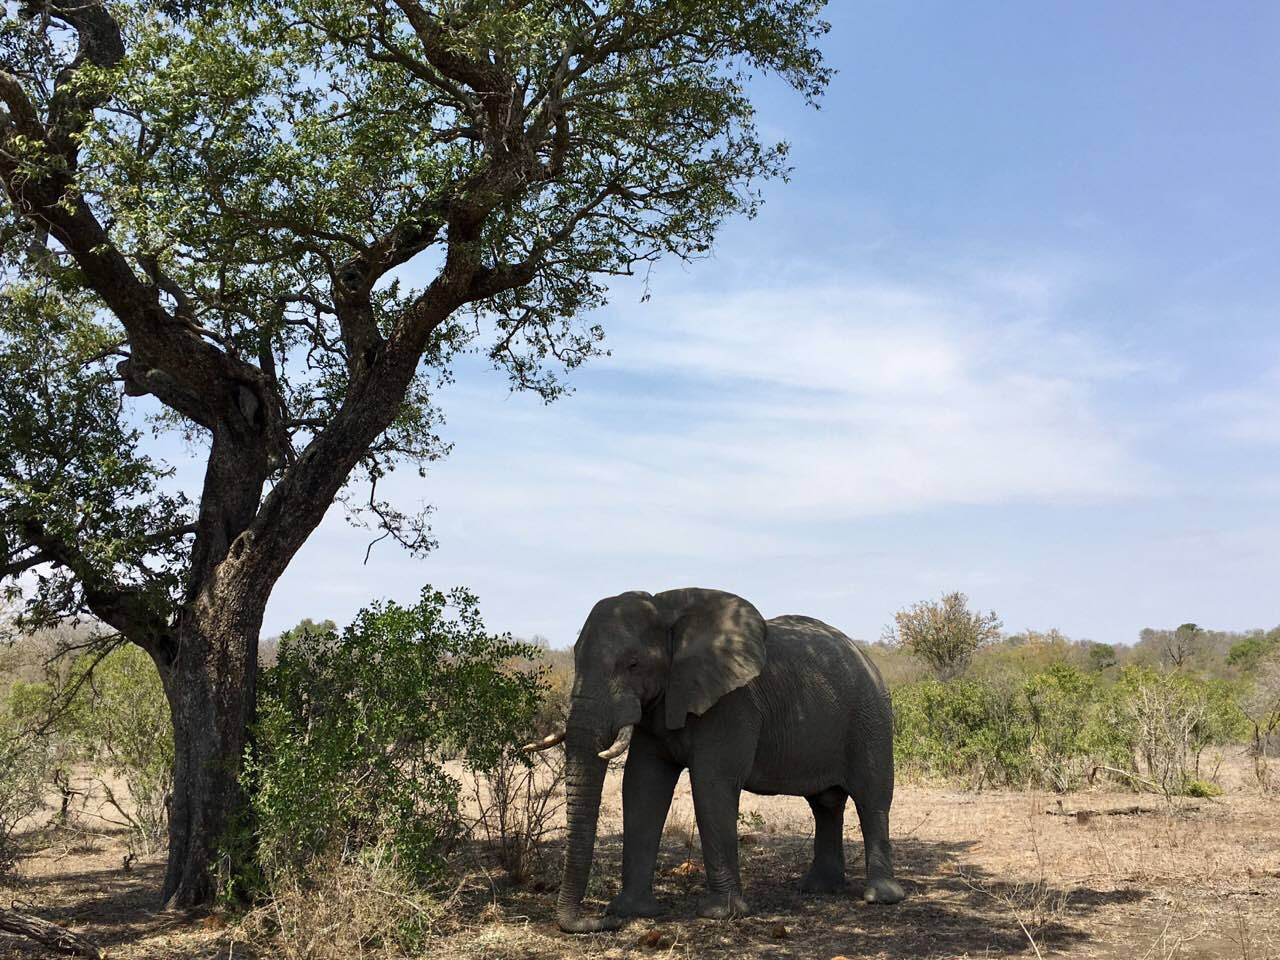 Beauty in a Barren Land (South African Bush, Day 2)